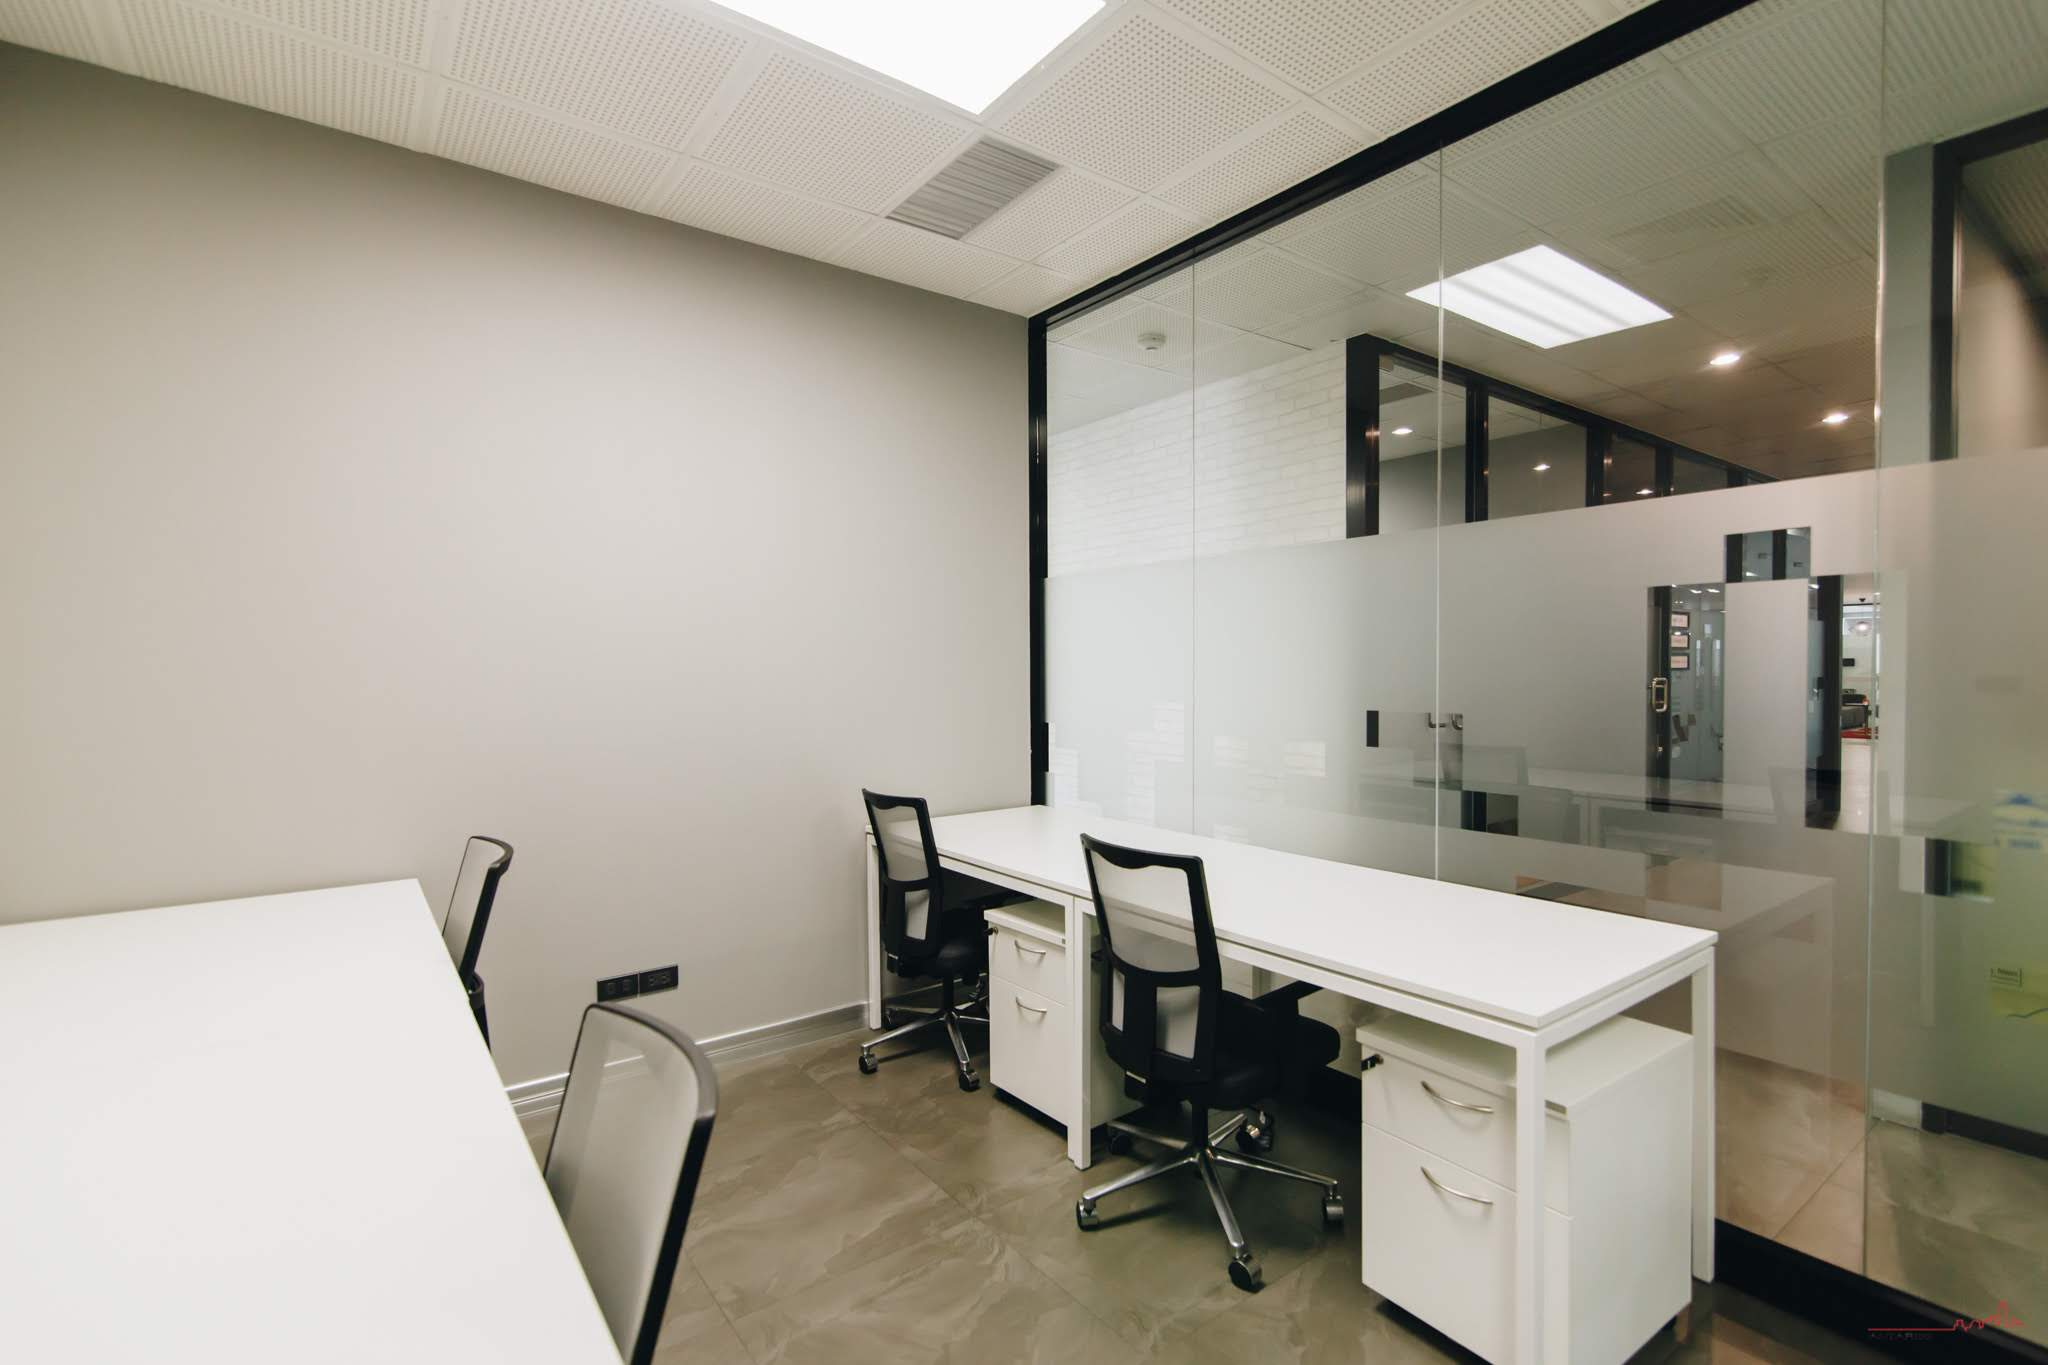 4-person-corridor-office